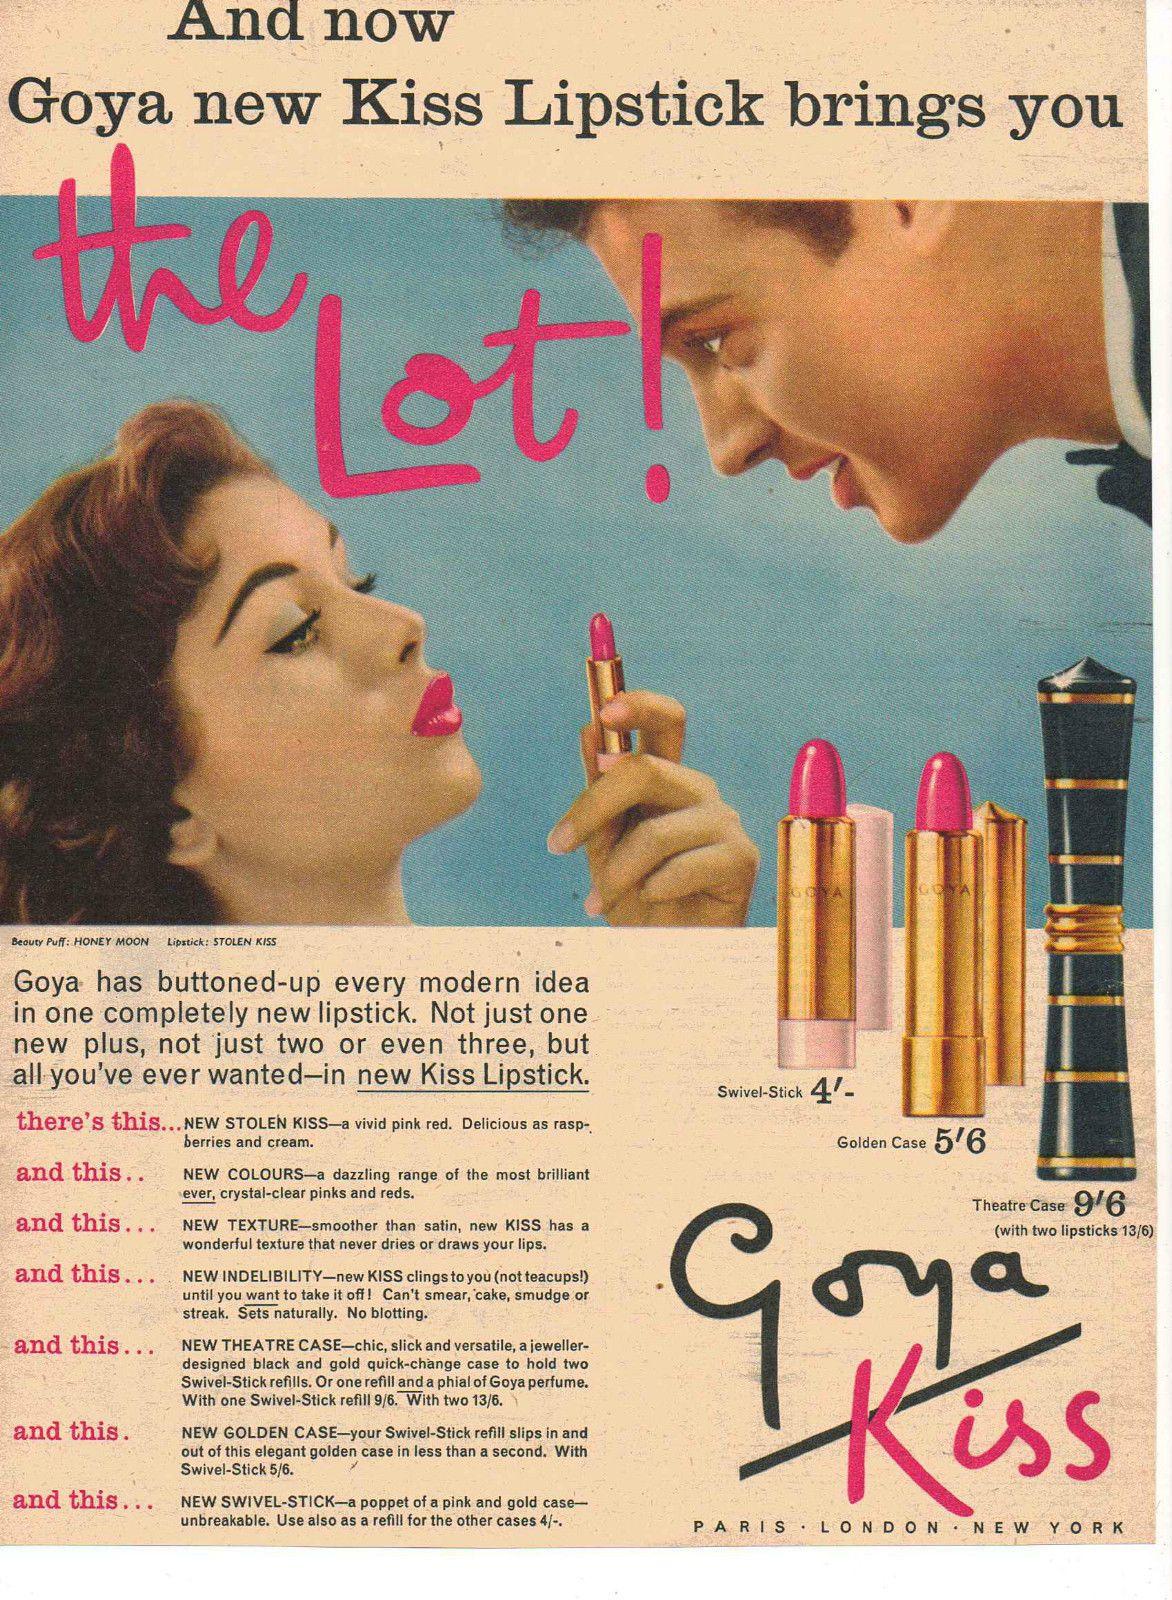 Goya 'Kiss' Lipstick Ad Lipstick ad, Vintage cosmetics